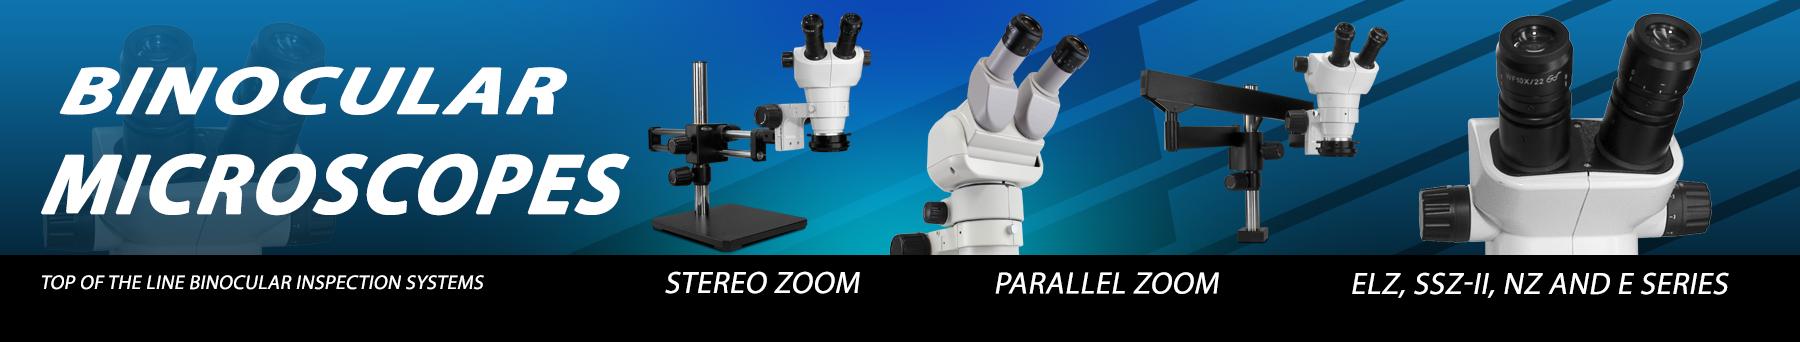 Scienscope: Binocular Microscopes - E-Series Parallel Zoom